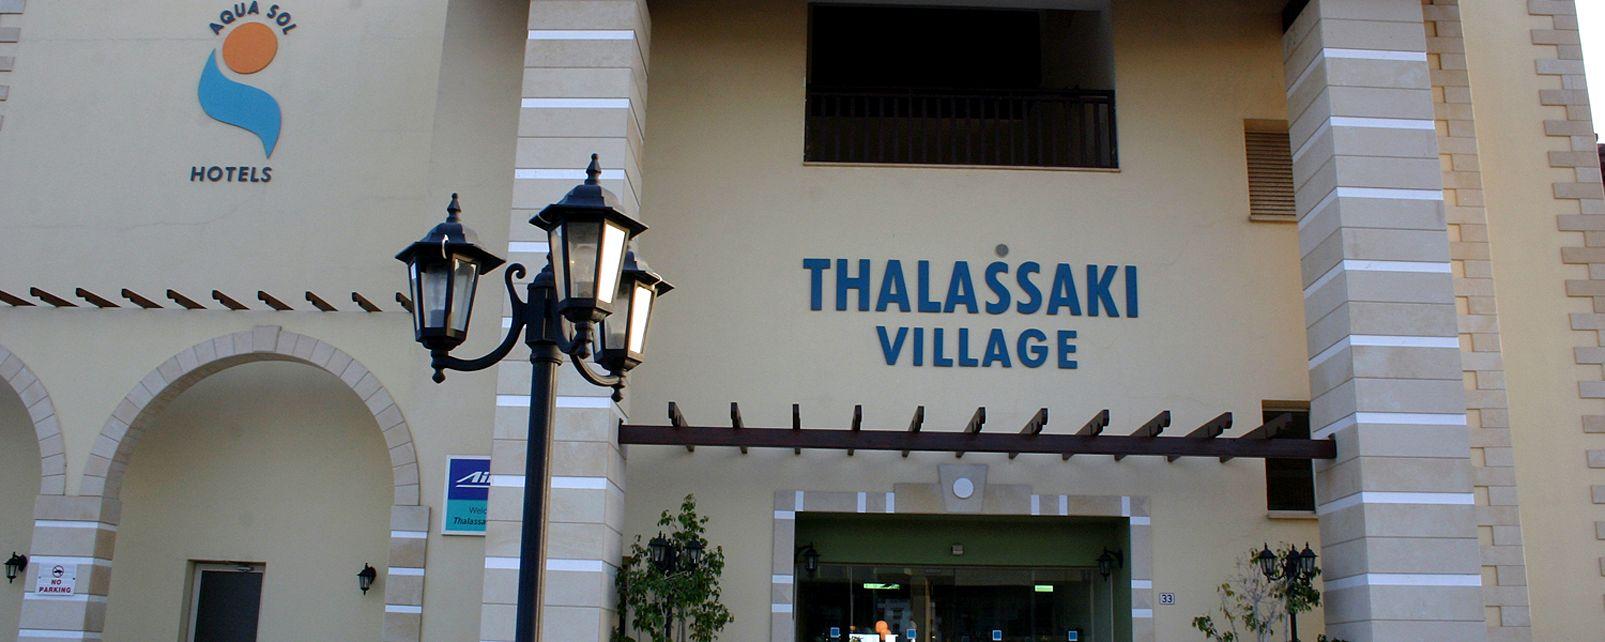 Hotel Thalassaki Tourist Village